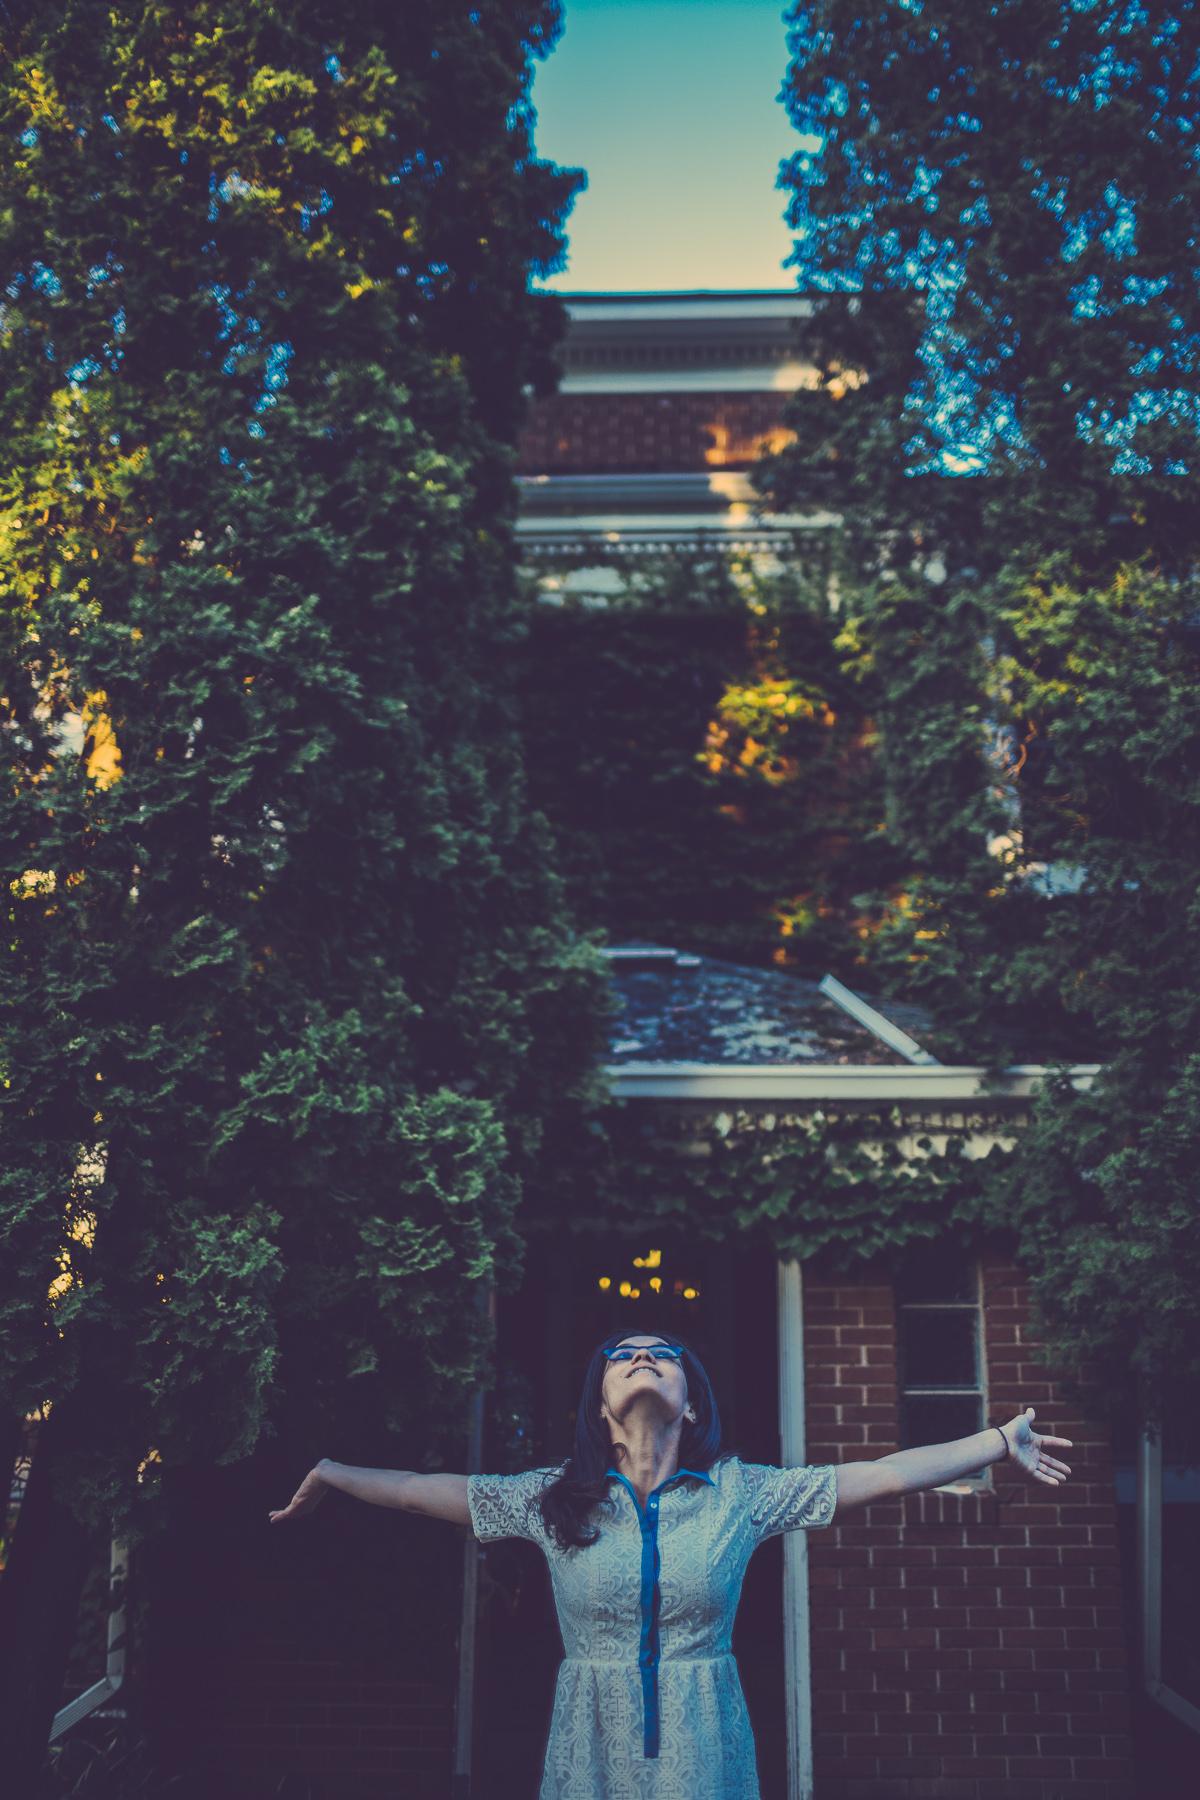 Lydia_Nihart_At_The_Outing_Lodge_Stillwater_Minnesota_By_Photographer_Joe_Lemke_035.JPG